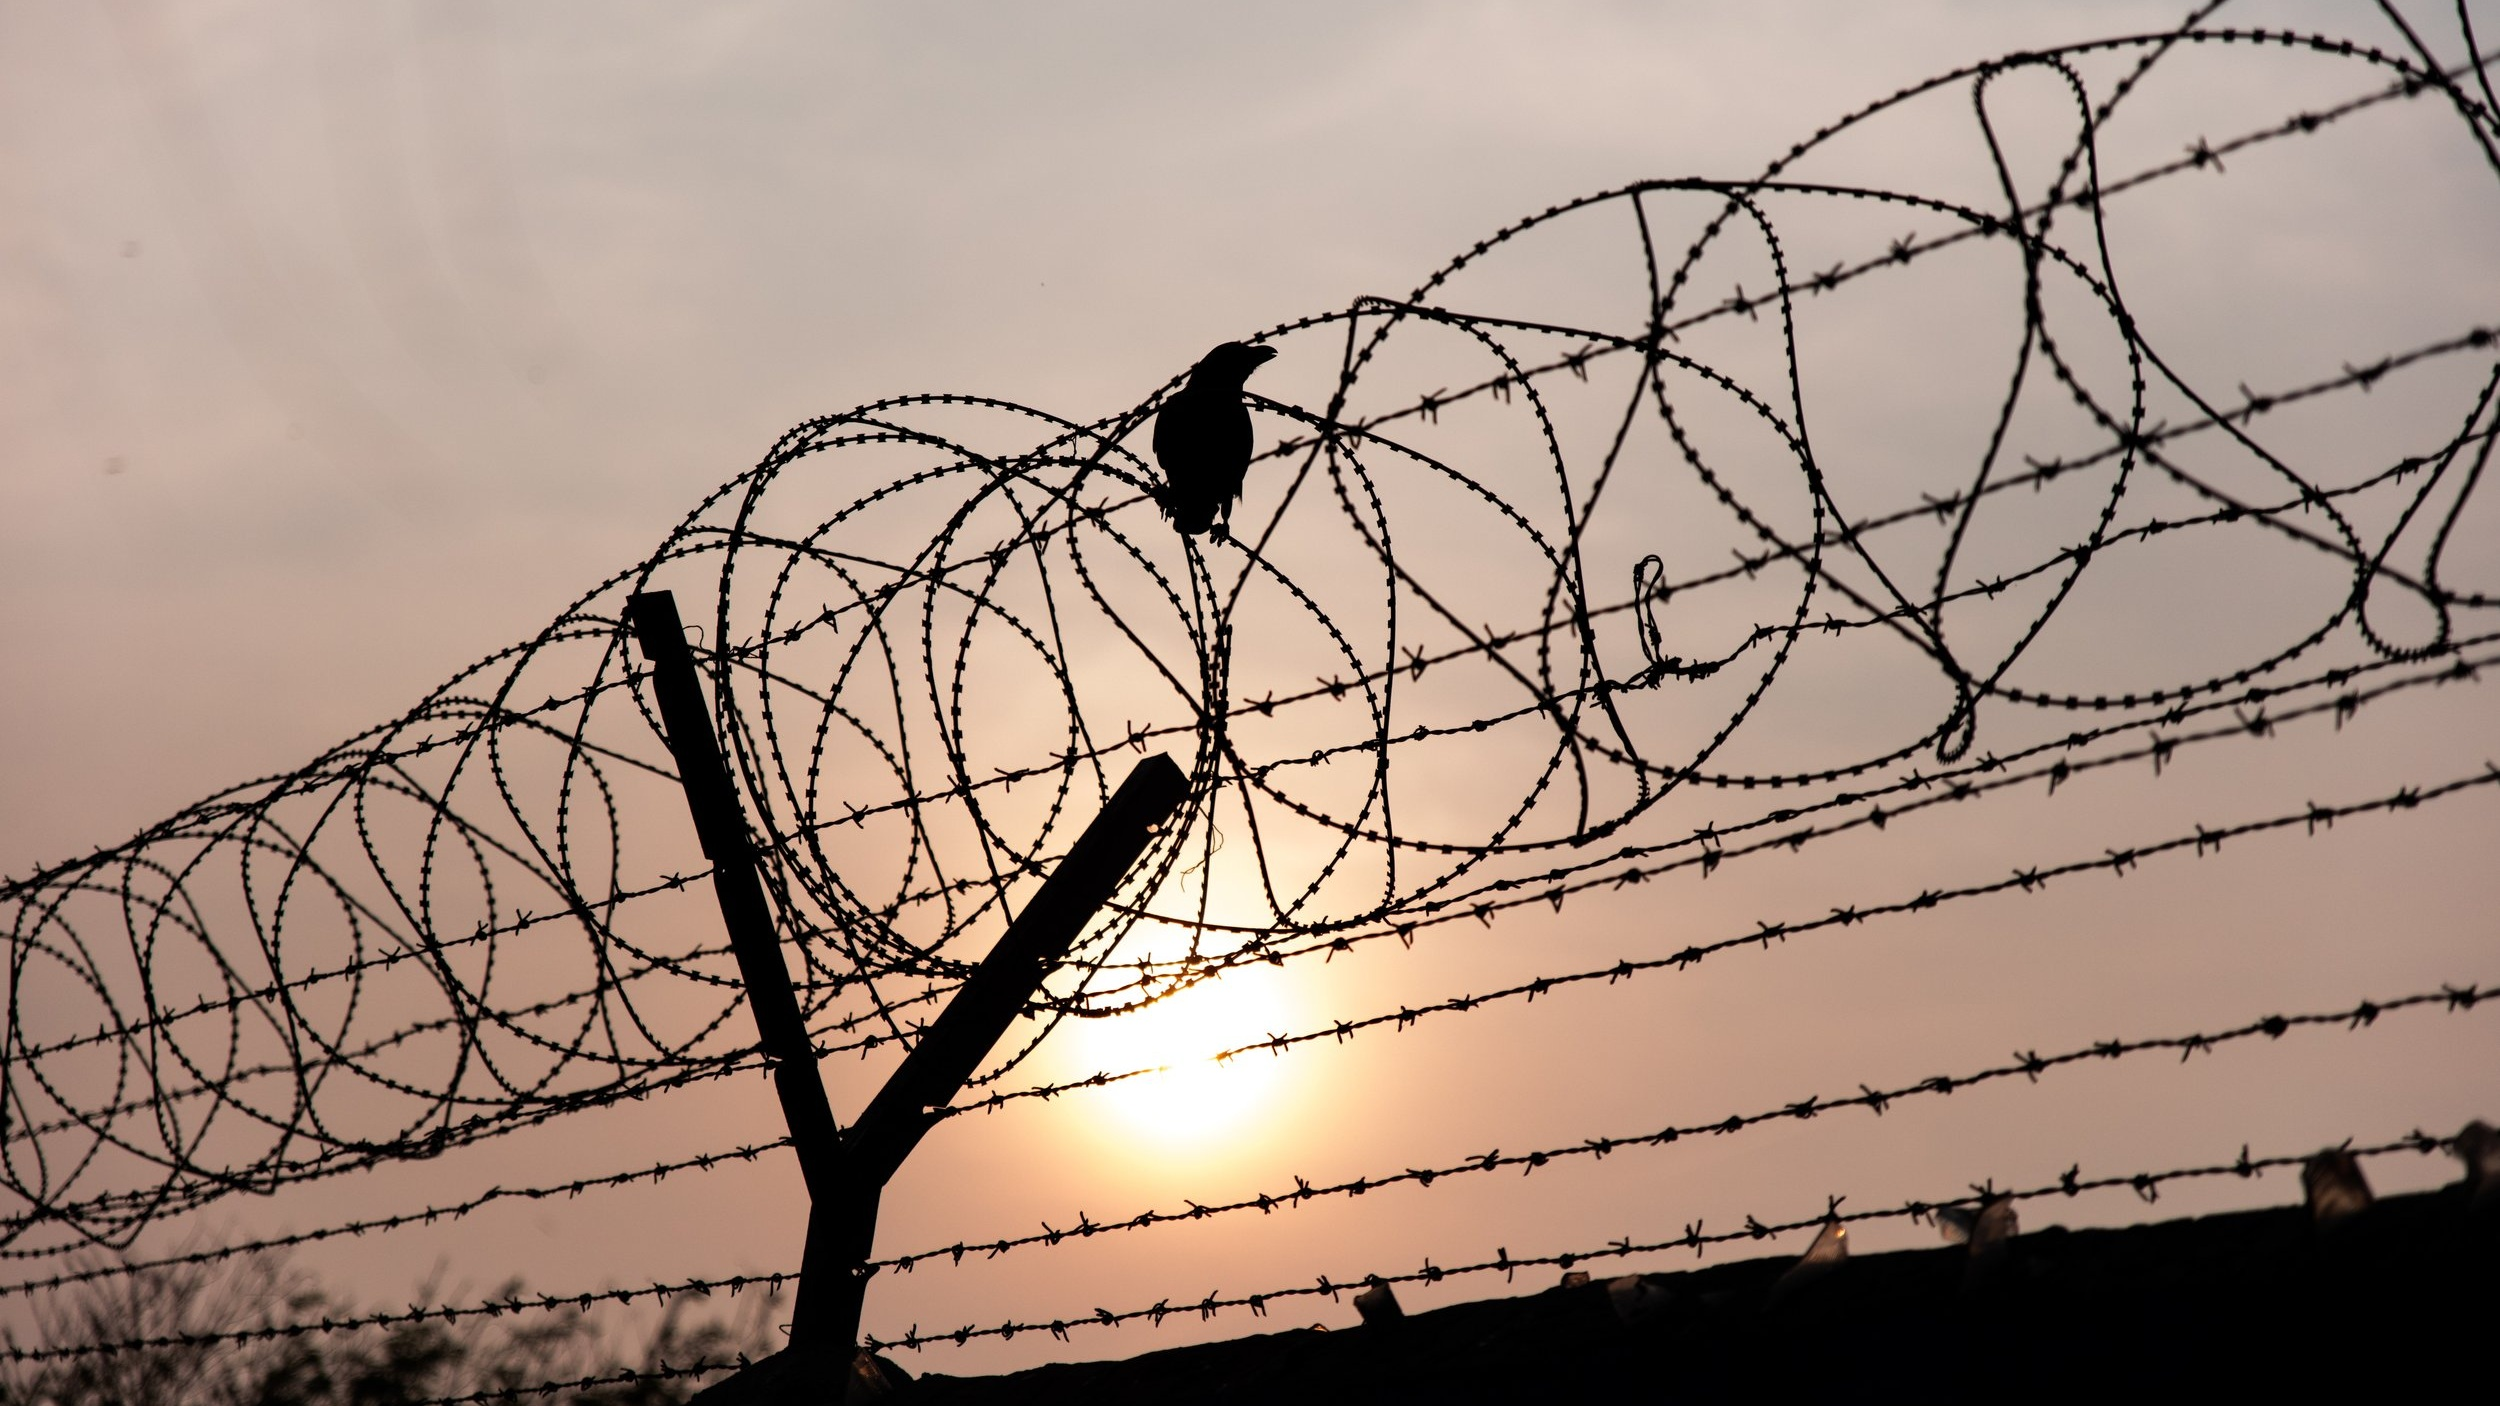 Barbed Wire Patrick Hendry Unsplash.jpg